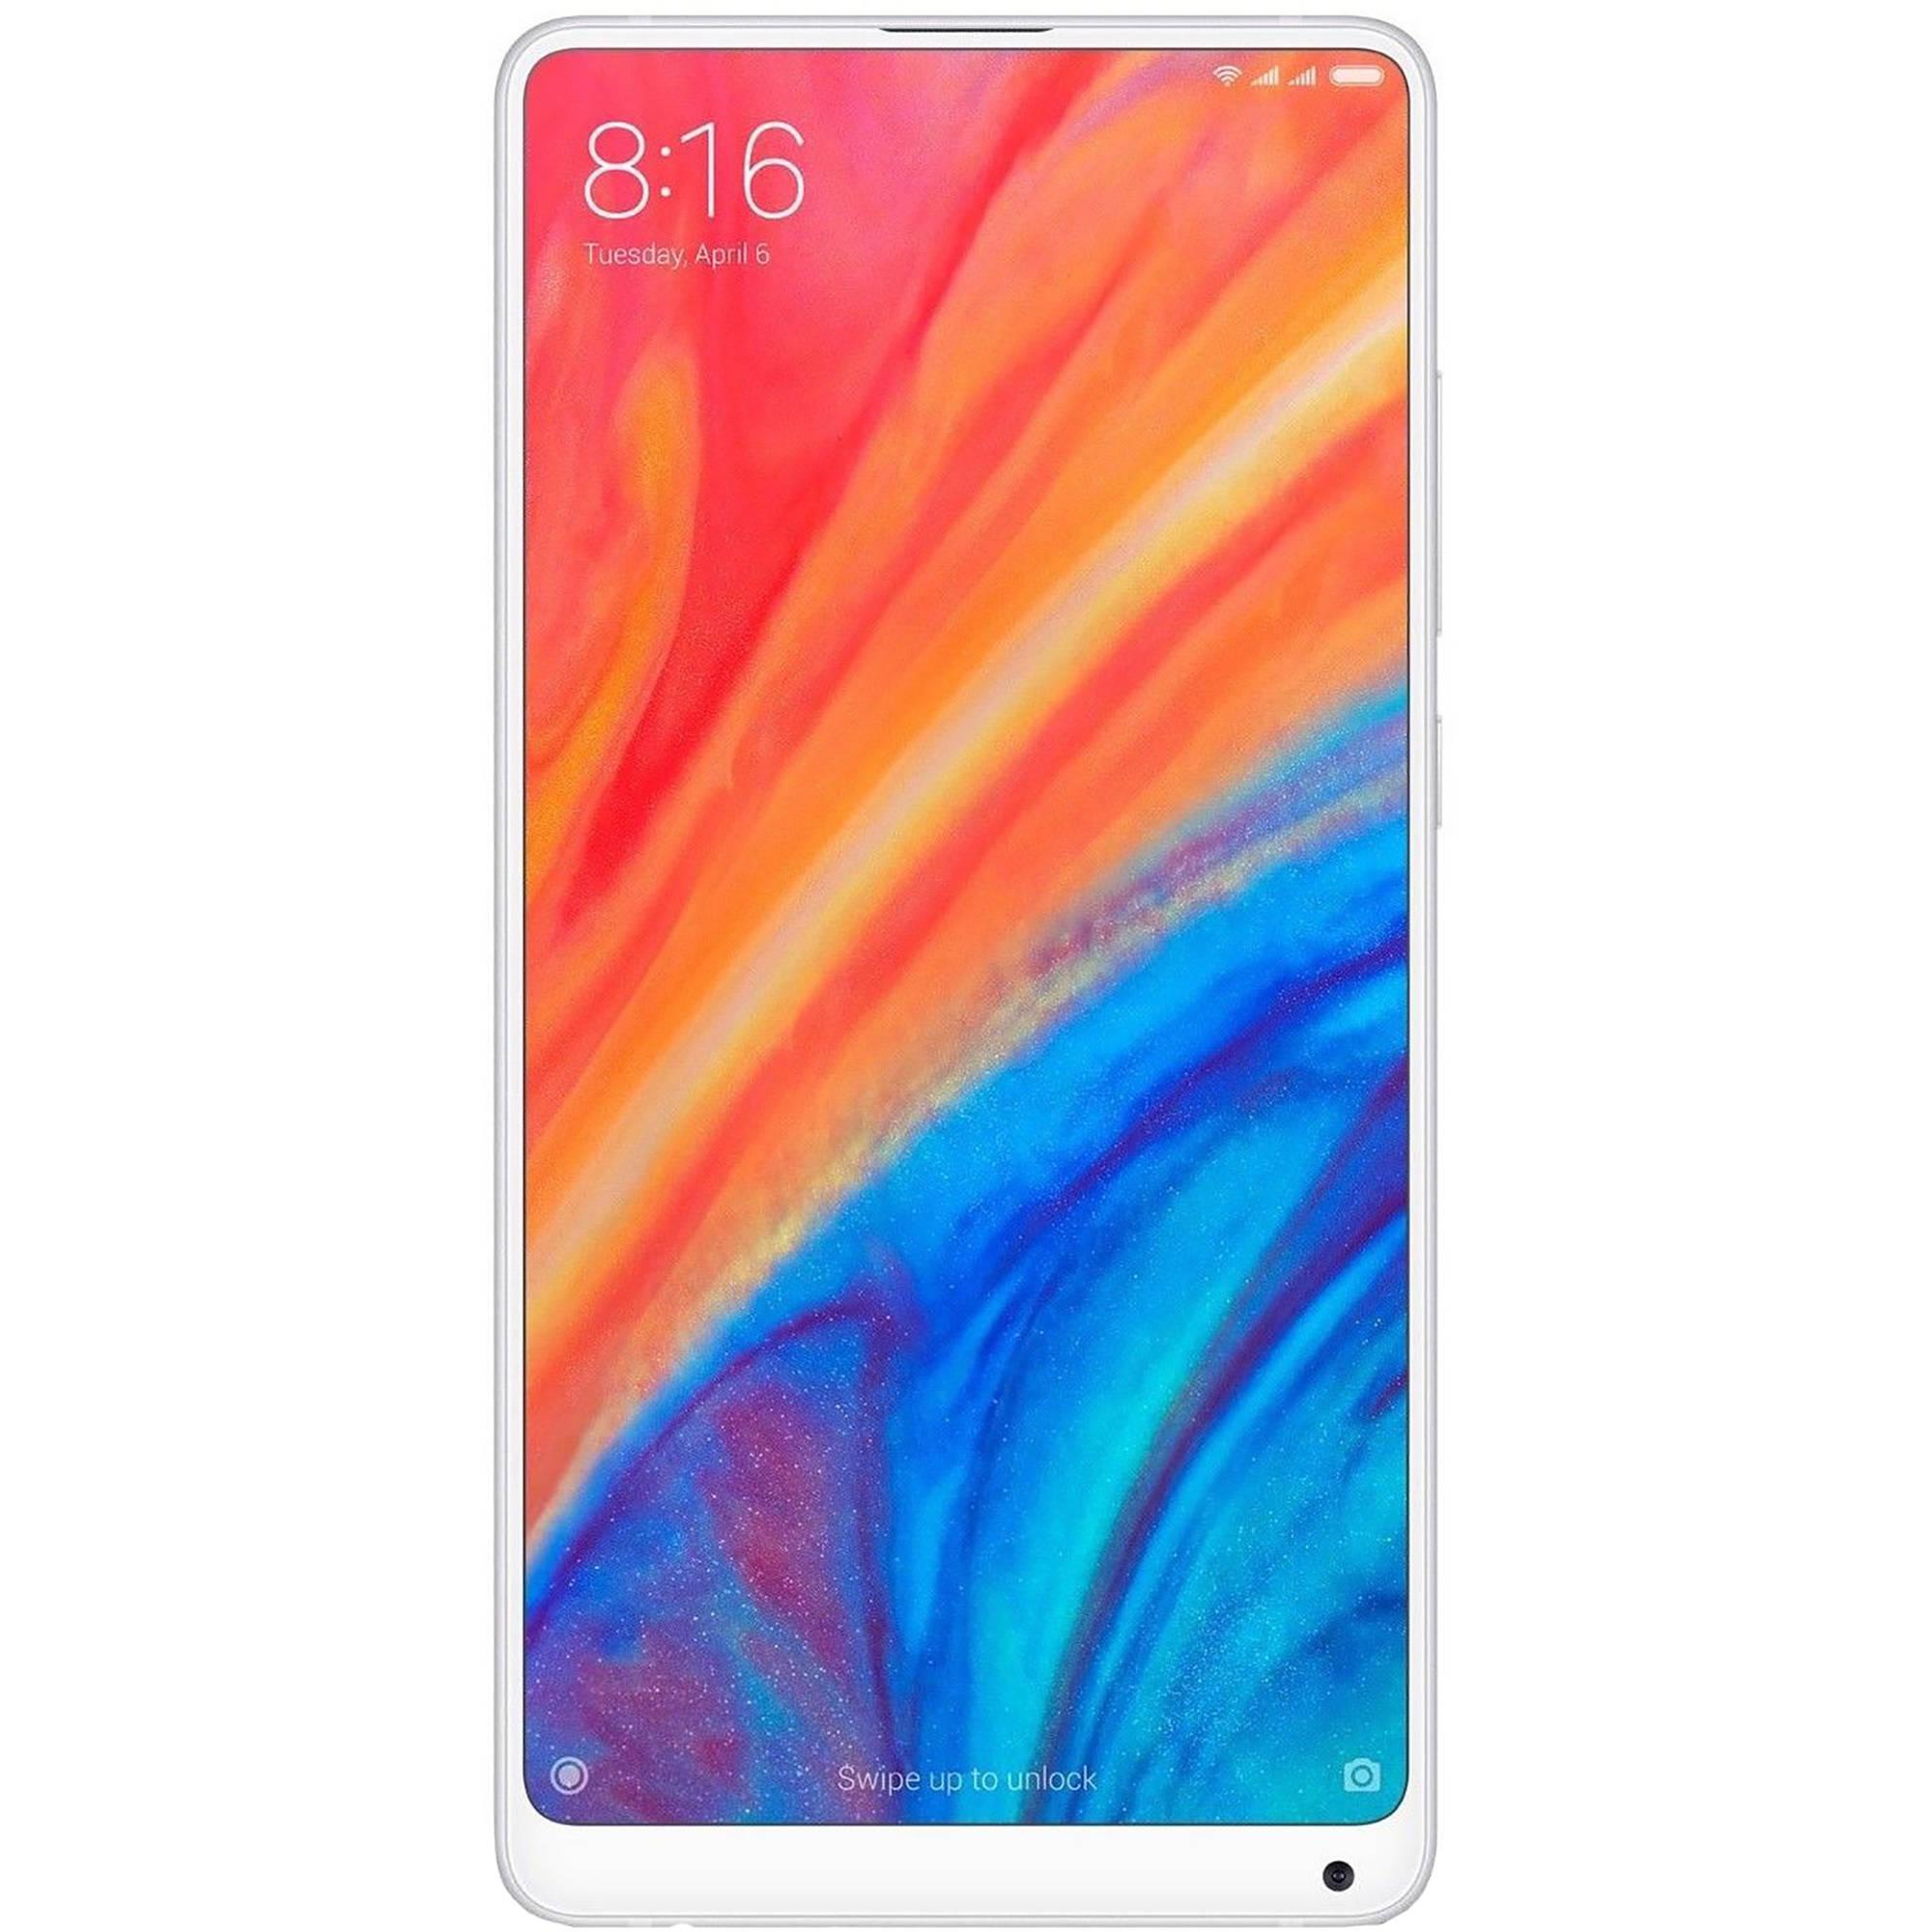 Xiaomi Mi Mix 2S Dual-SIM 64GB Smartphone (Unlocked, White)